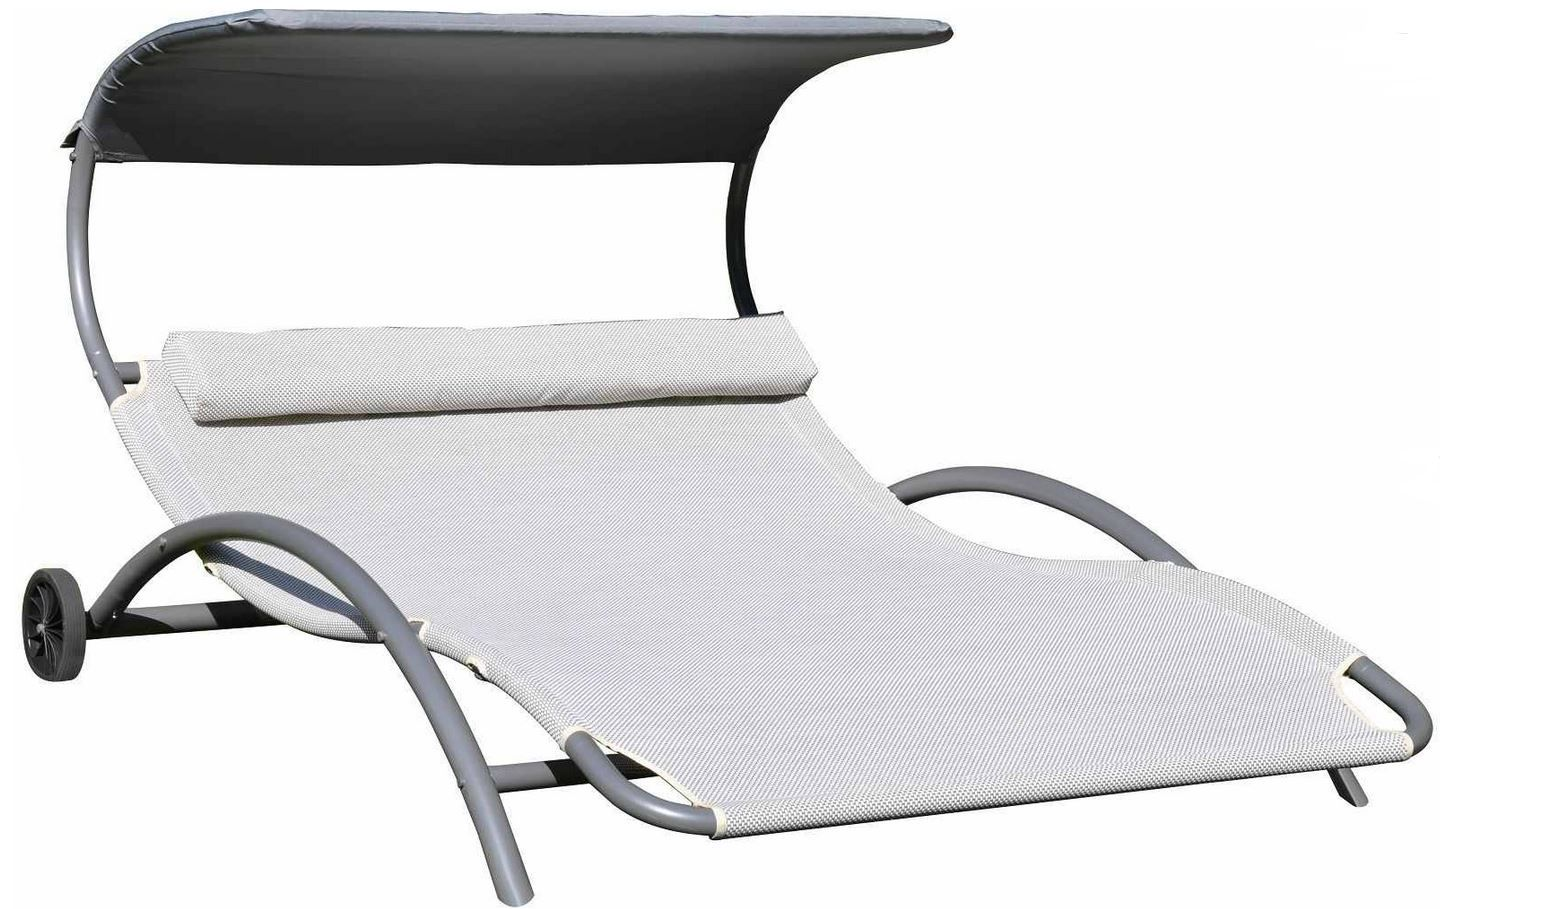 leco 2 personen sonnenliege f r 99 95. Black Bedroom Furniture Sets. Home Design Ideas